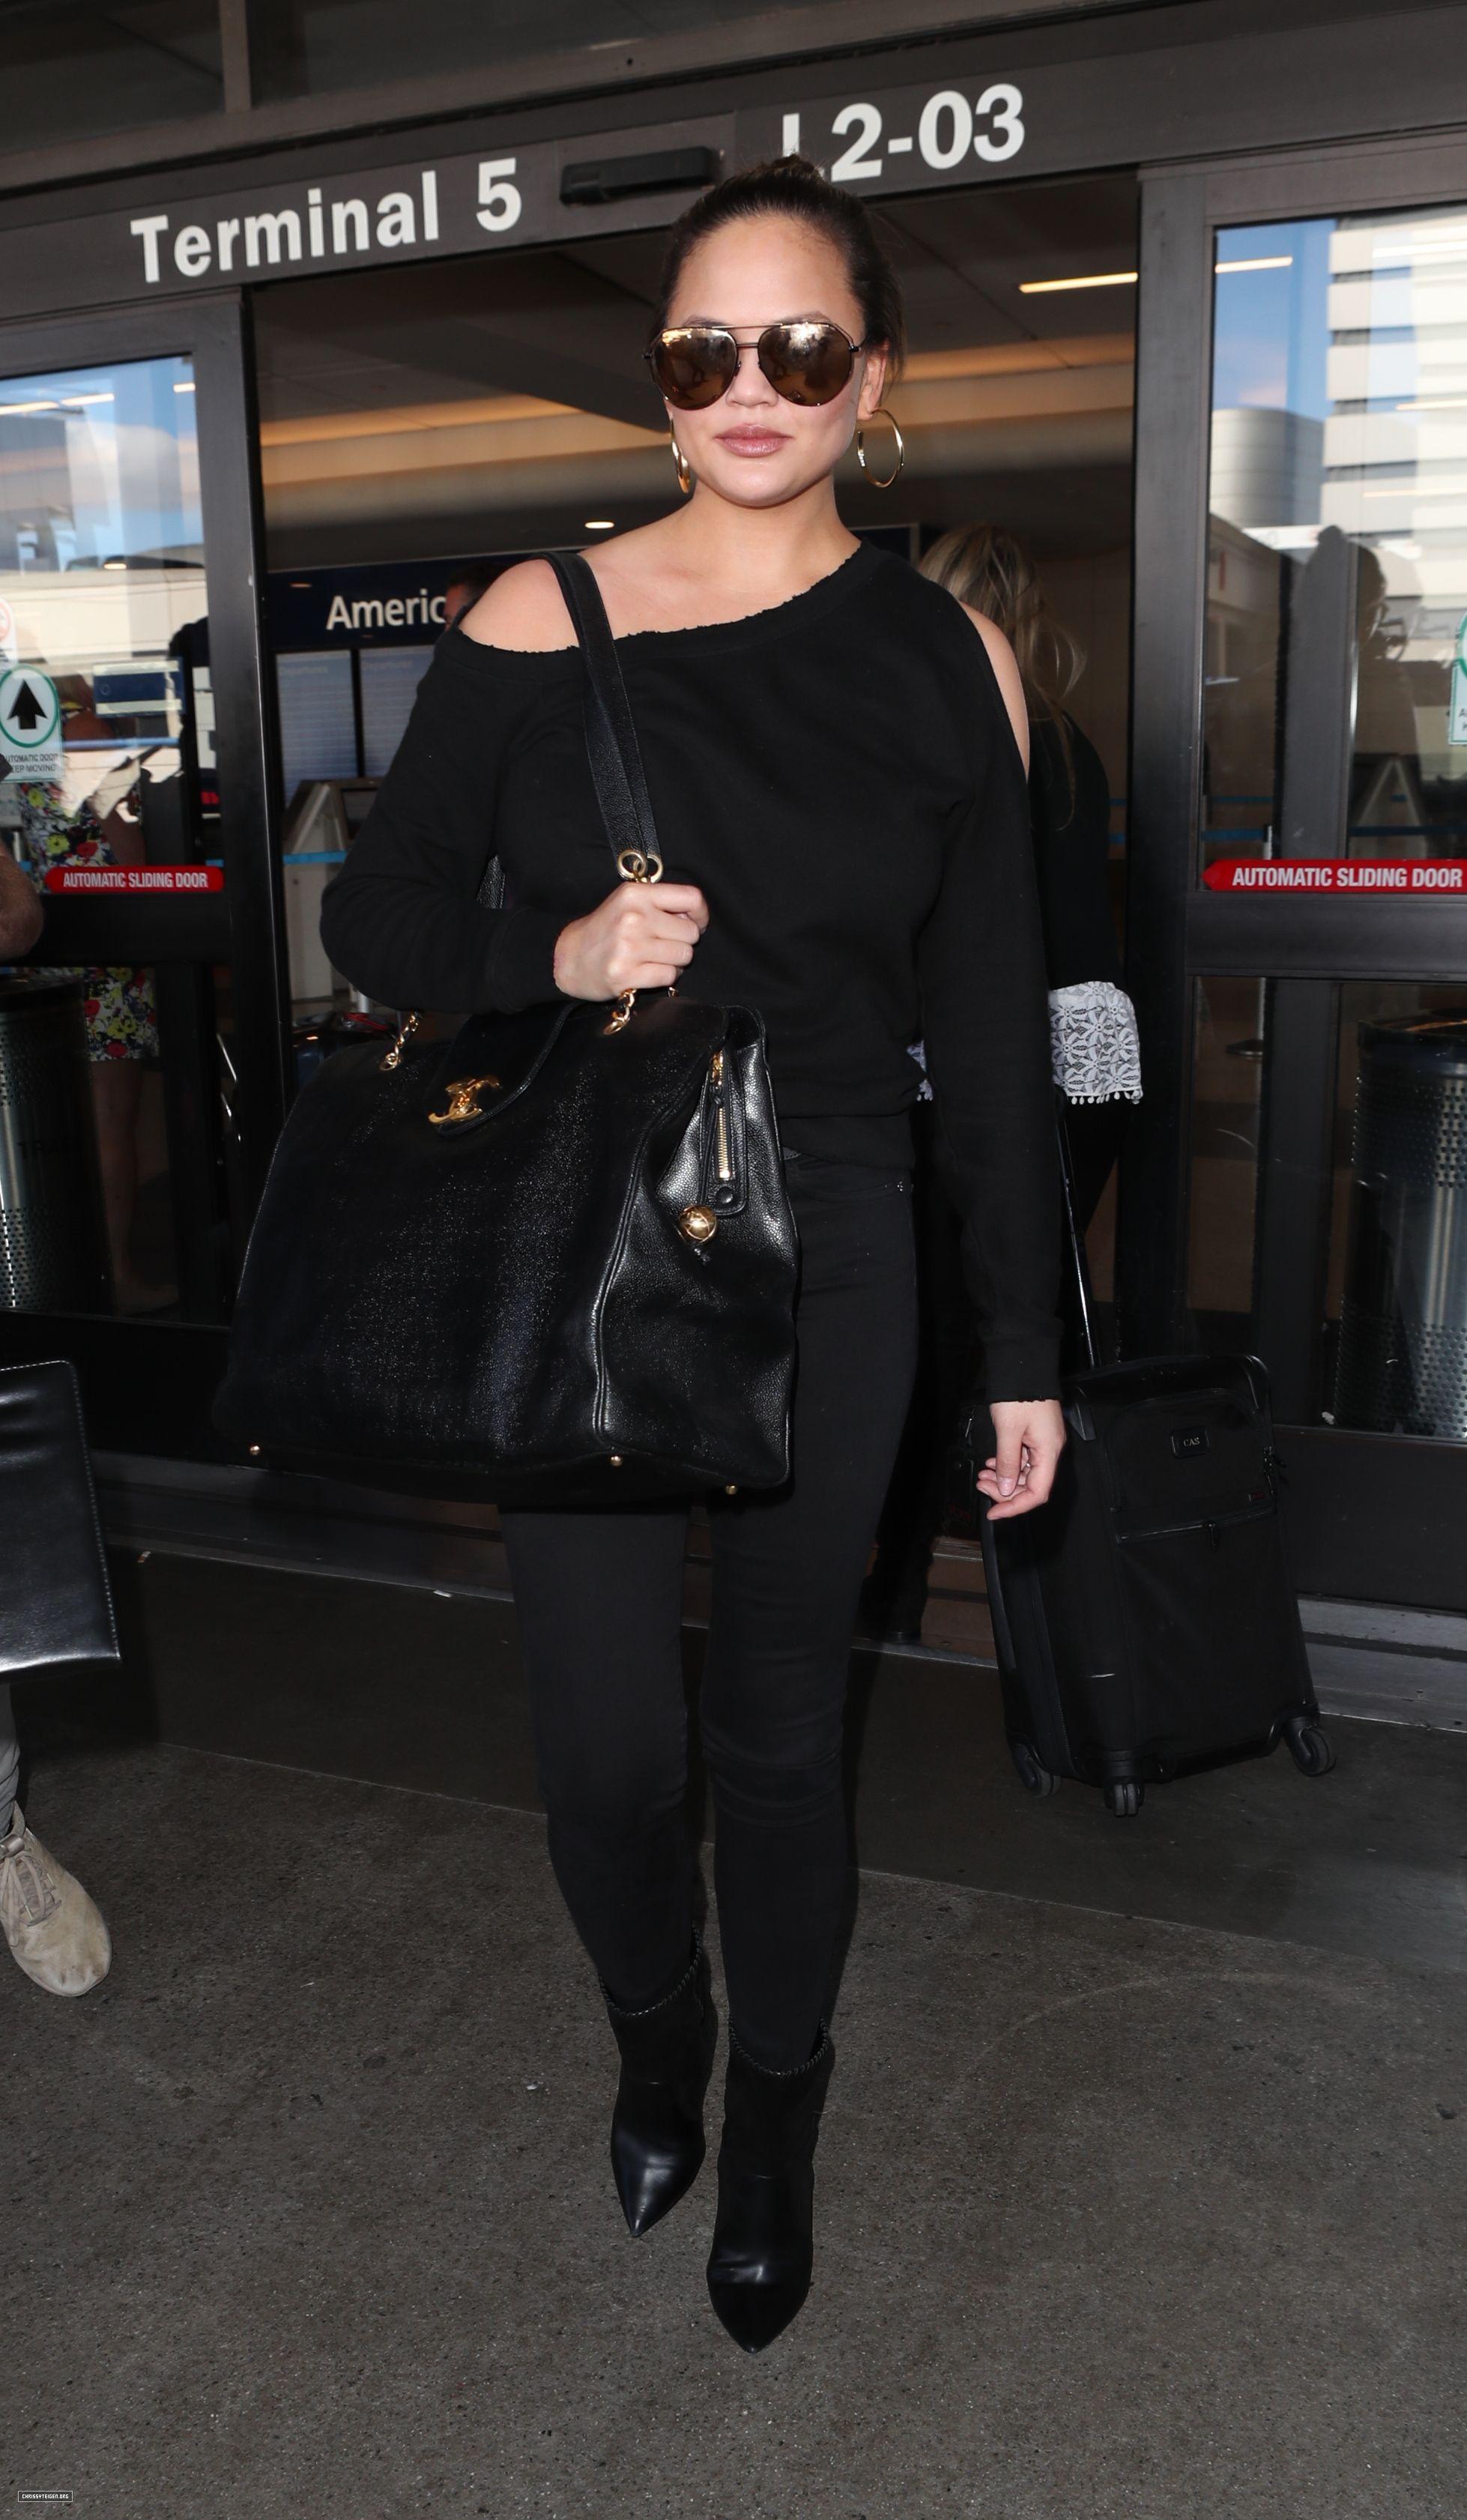 November 09, 2017 Chrissy Teigen leaving the Los Angeles